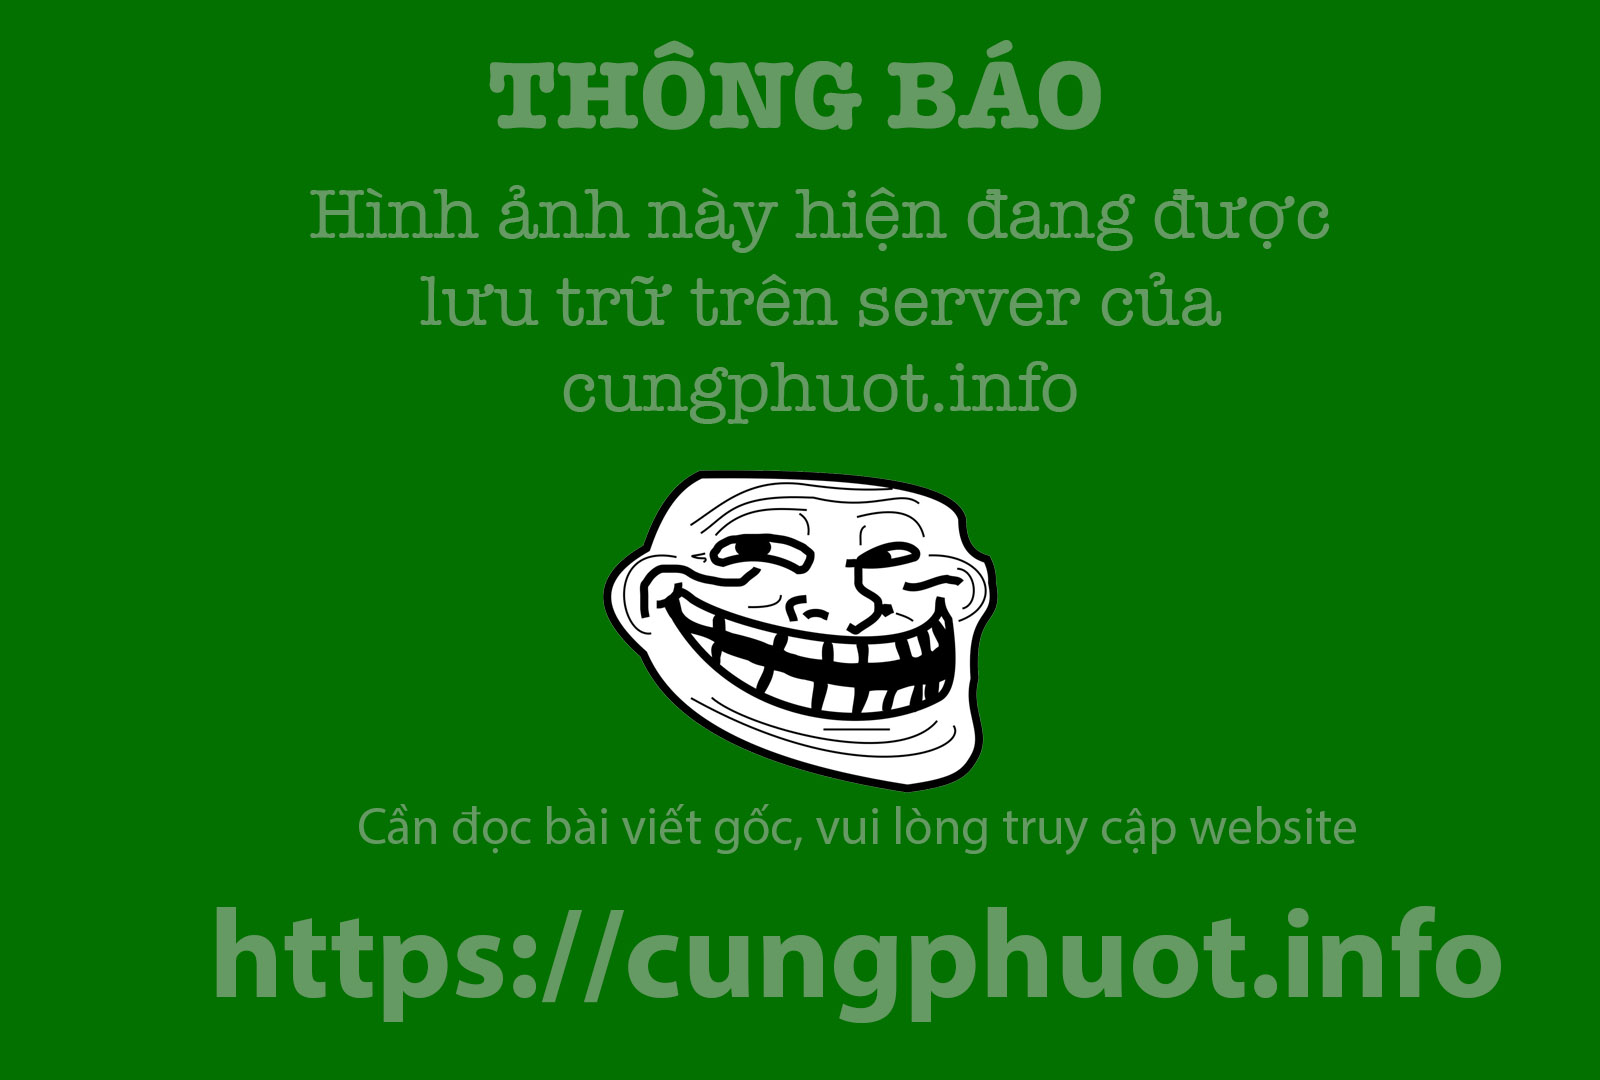 Chon bien cuong 'troi thap, dat cao' o Nam Can hinh anh 9